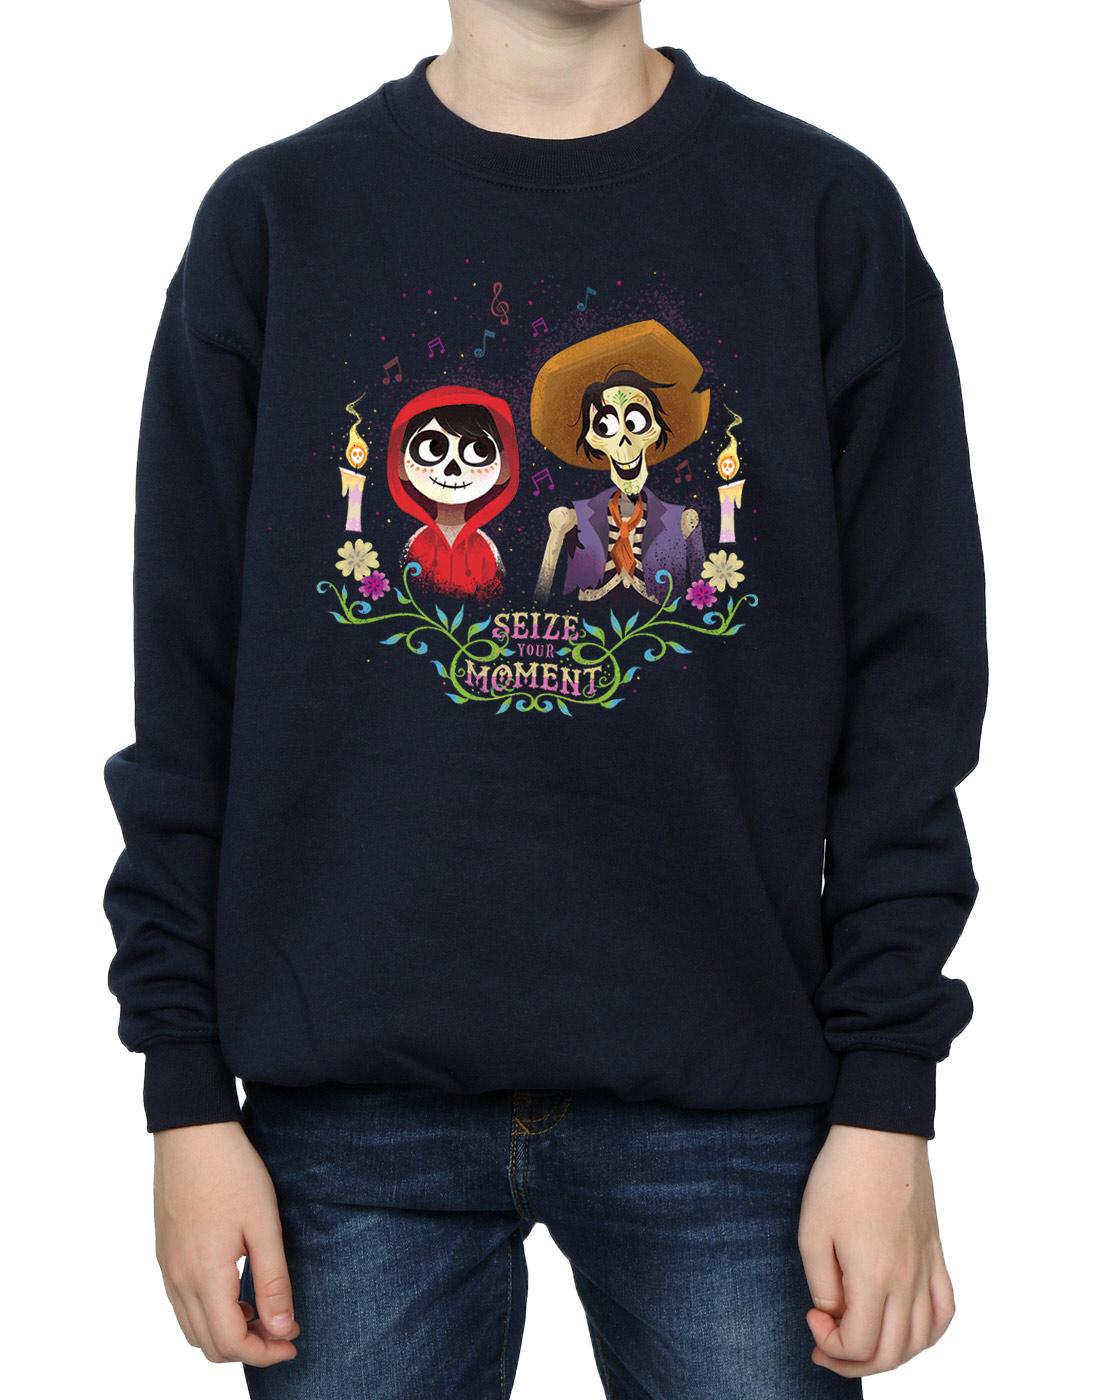 aa118ca70bd5 Disney-Boys-Coco-Miguel-And-Hector-Sweatshirt thumbnail 14